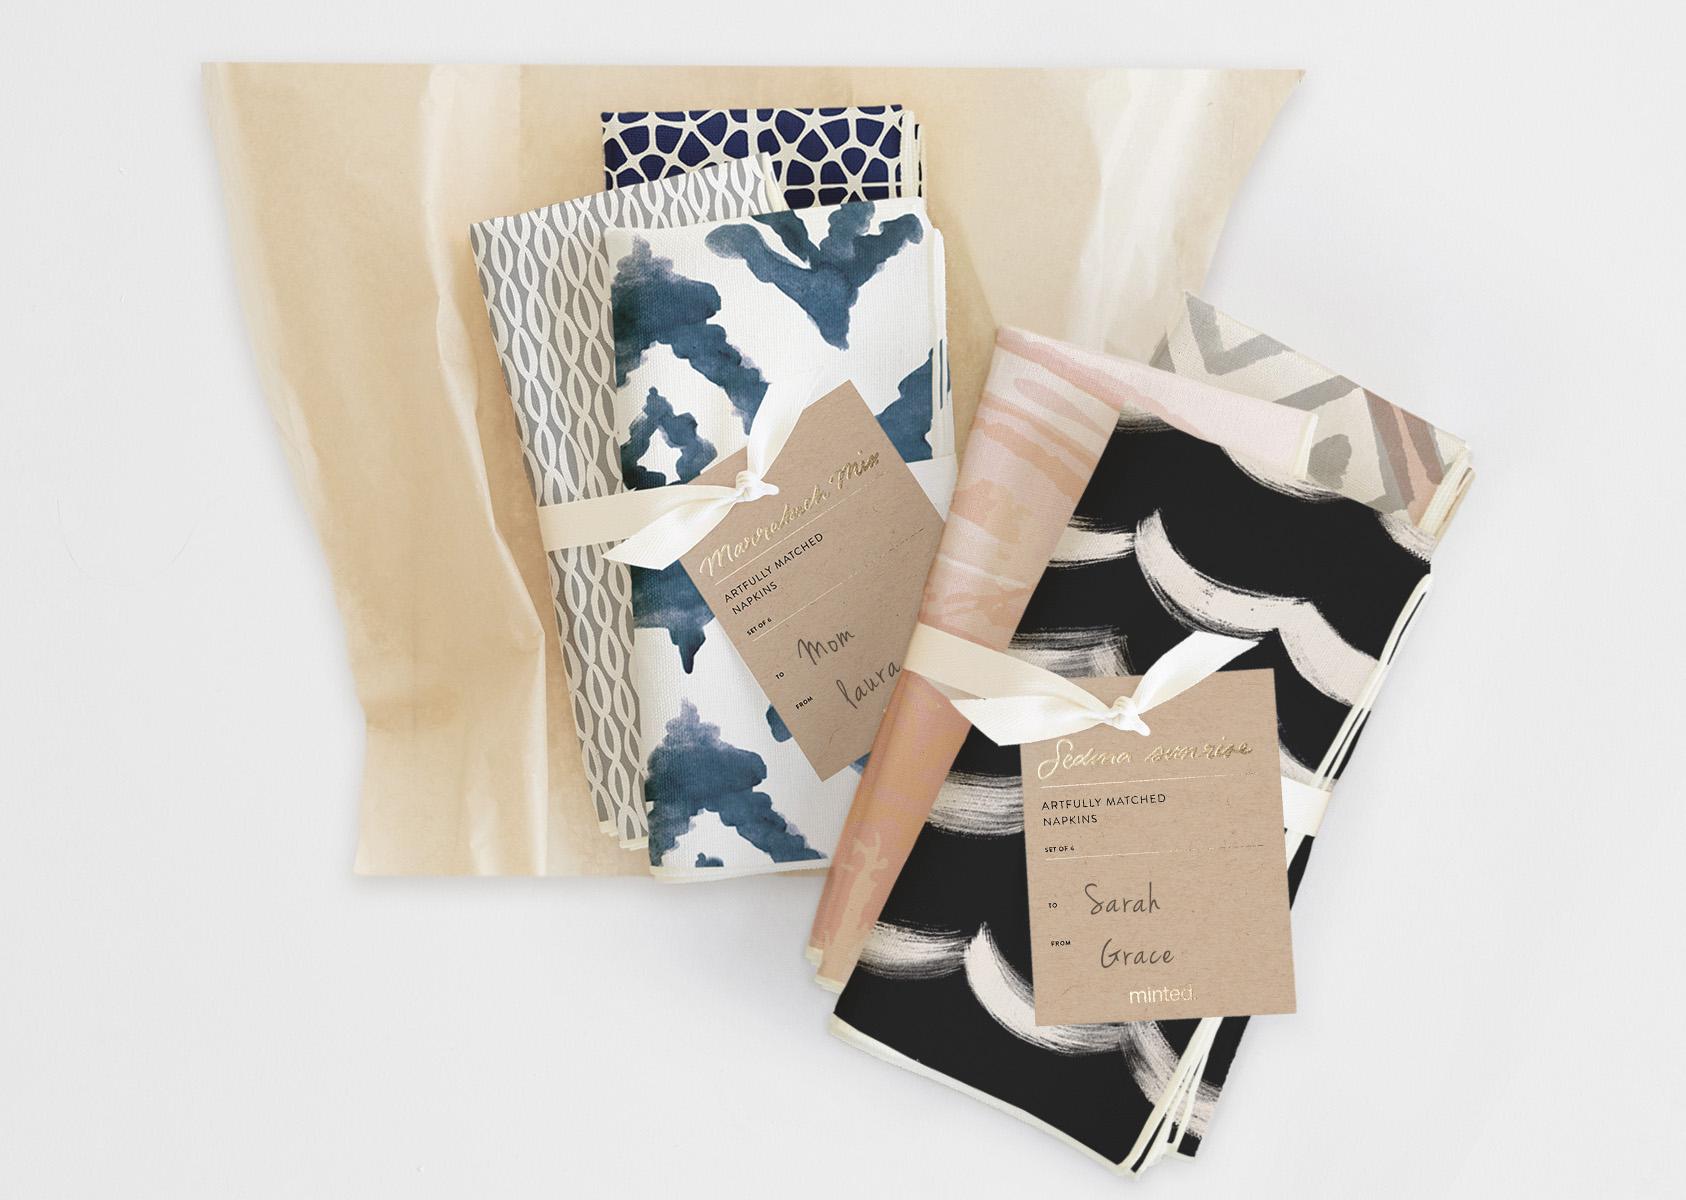 Hostess gift idea Minted napkin sets